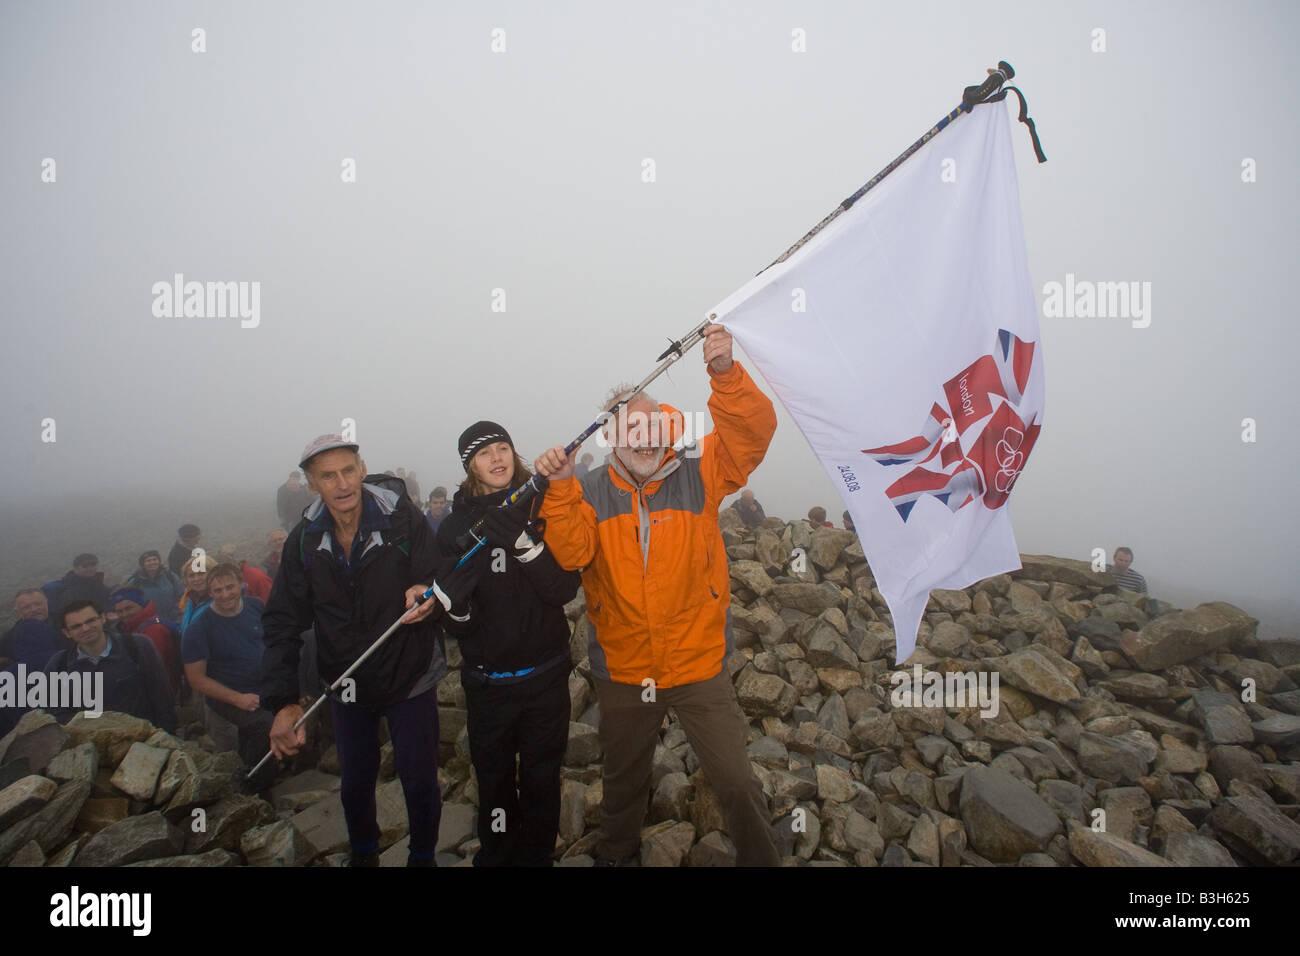 Sir Chris Bonington raises the London 2012 flag with fellrunner Jos Naylor and long distance runner Laura Park on - Stock Image